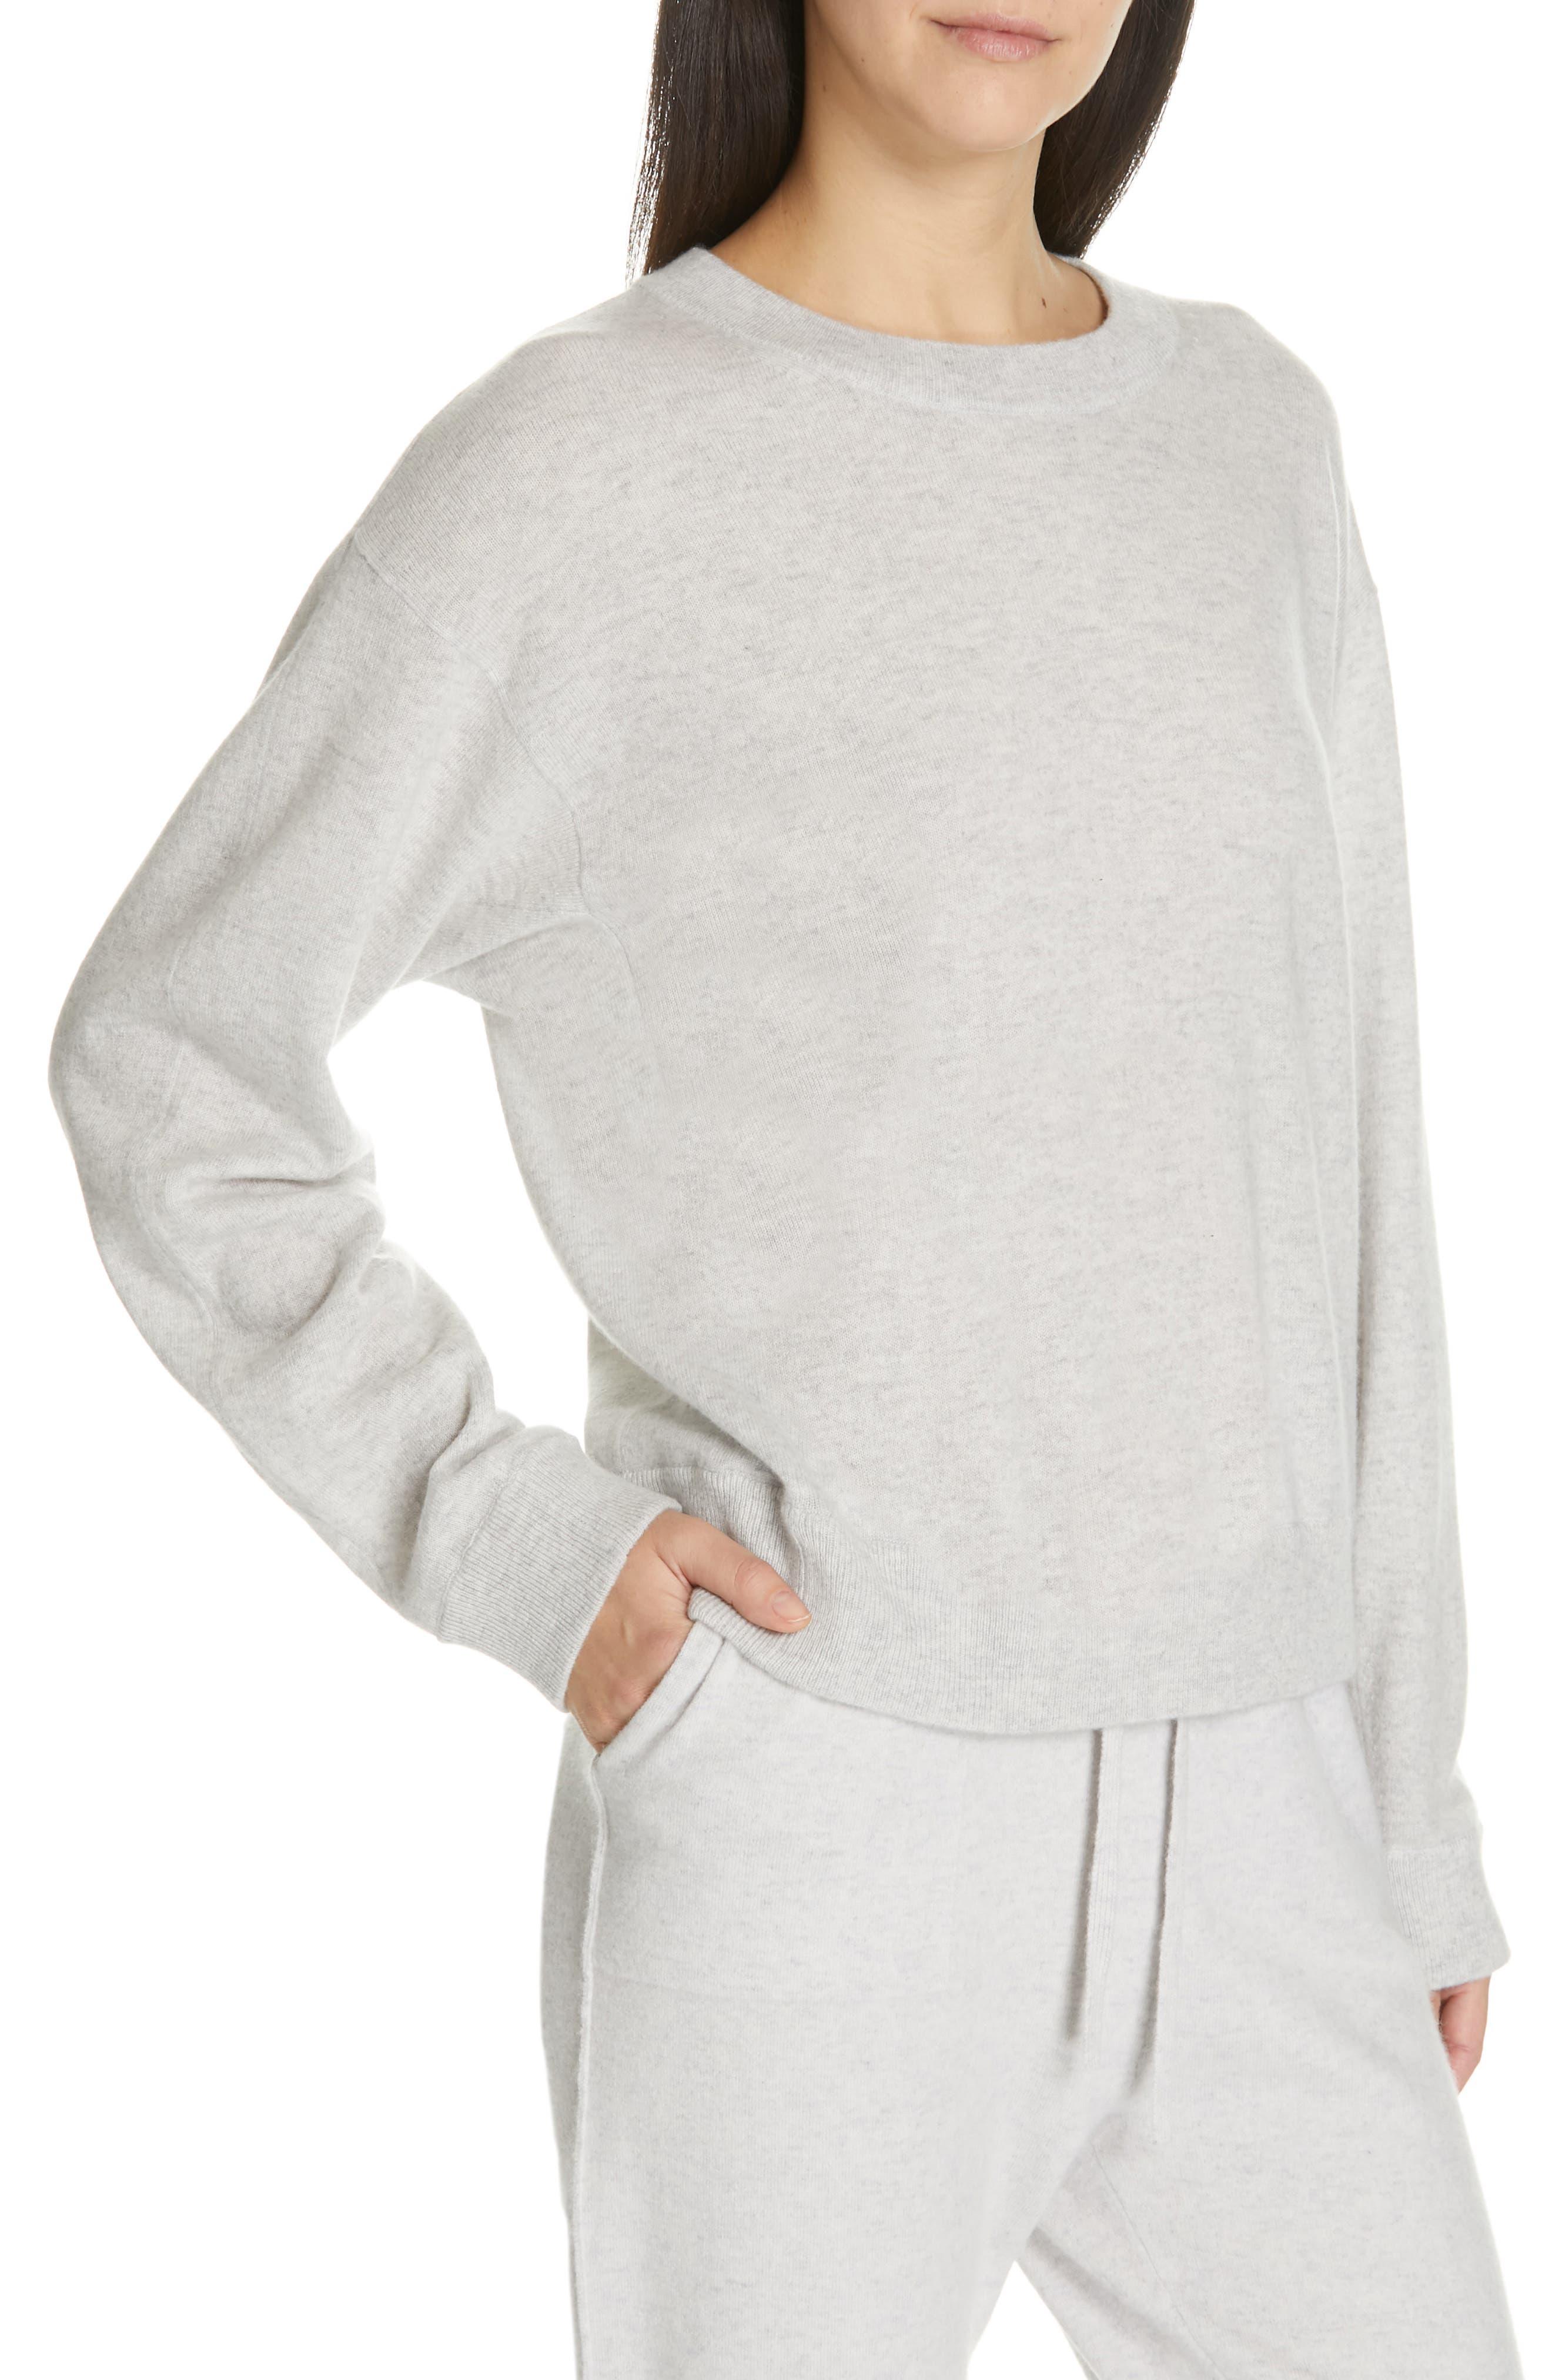 VINCE, Boxy Cashmere Sweater, Alternate thumbnail 4, color, LIGHT HEATHER GREY